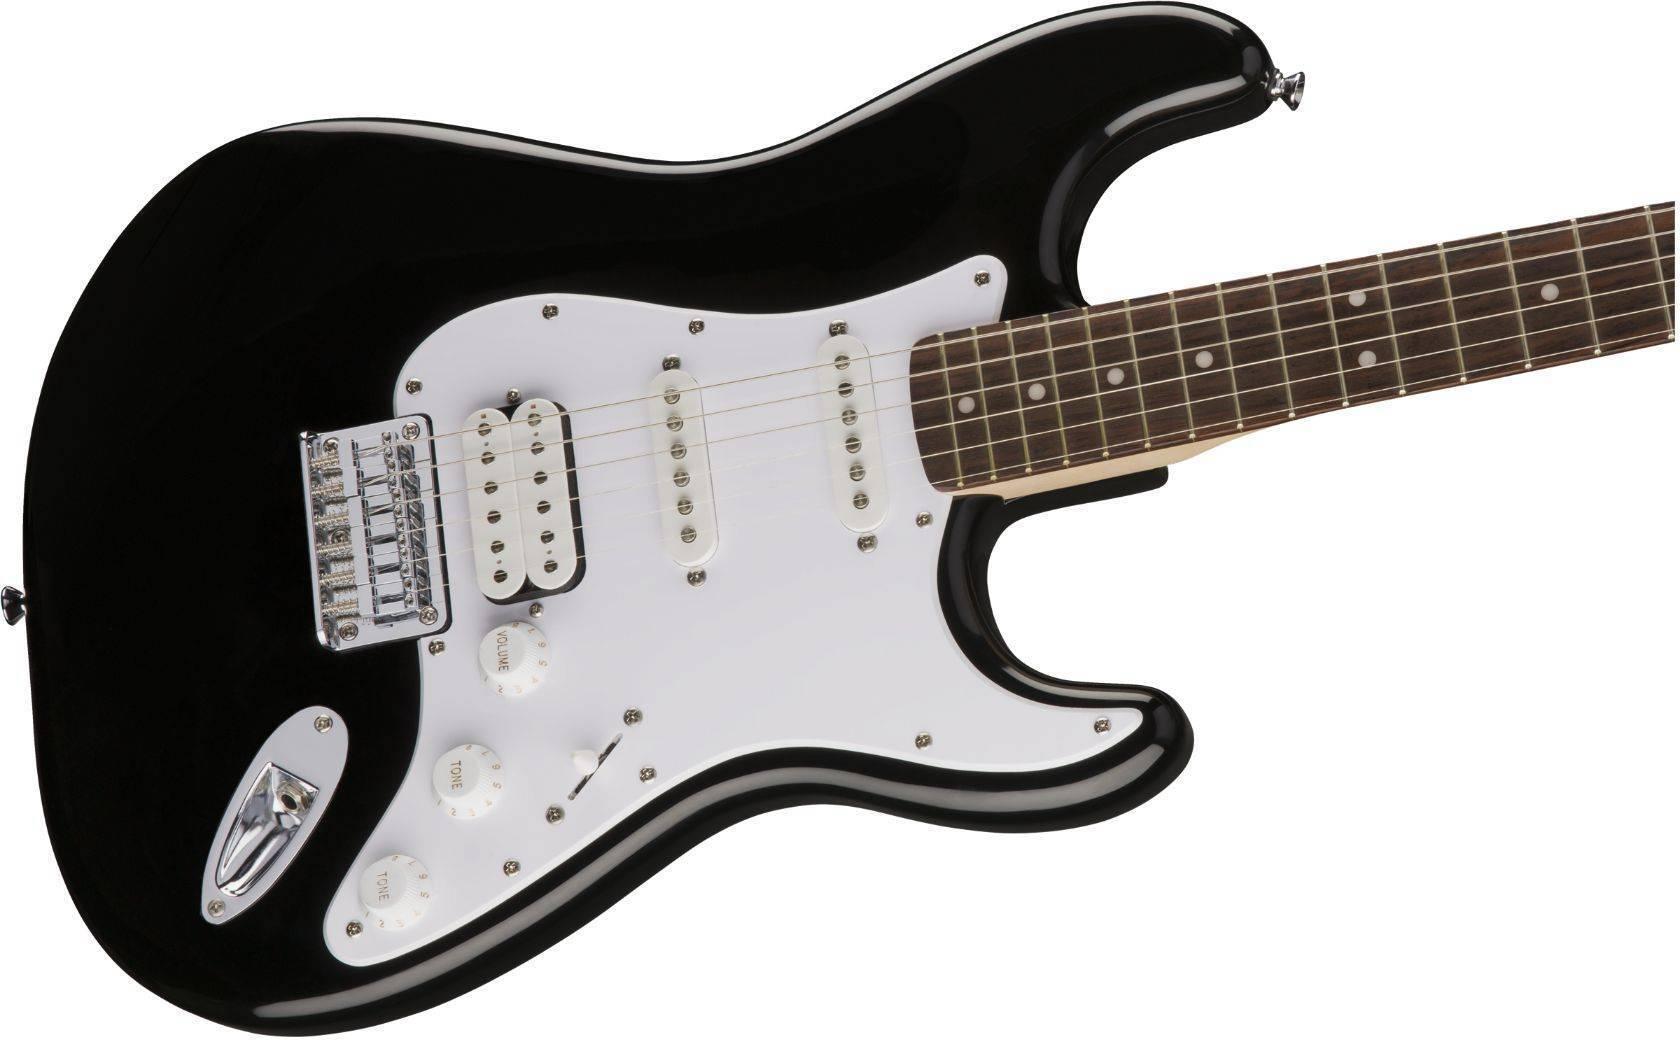 Guitarra Fender Sq Bullet Strat Ht Hss Negra